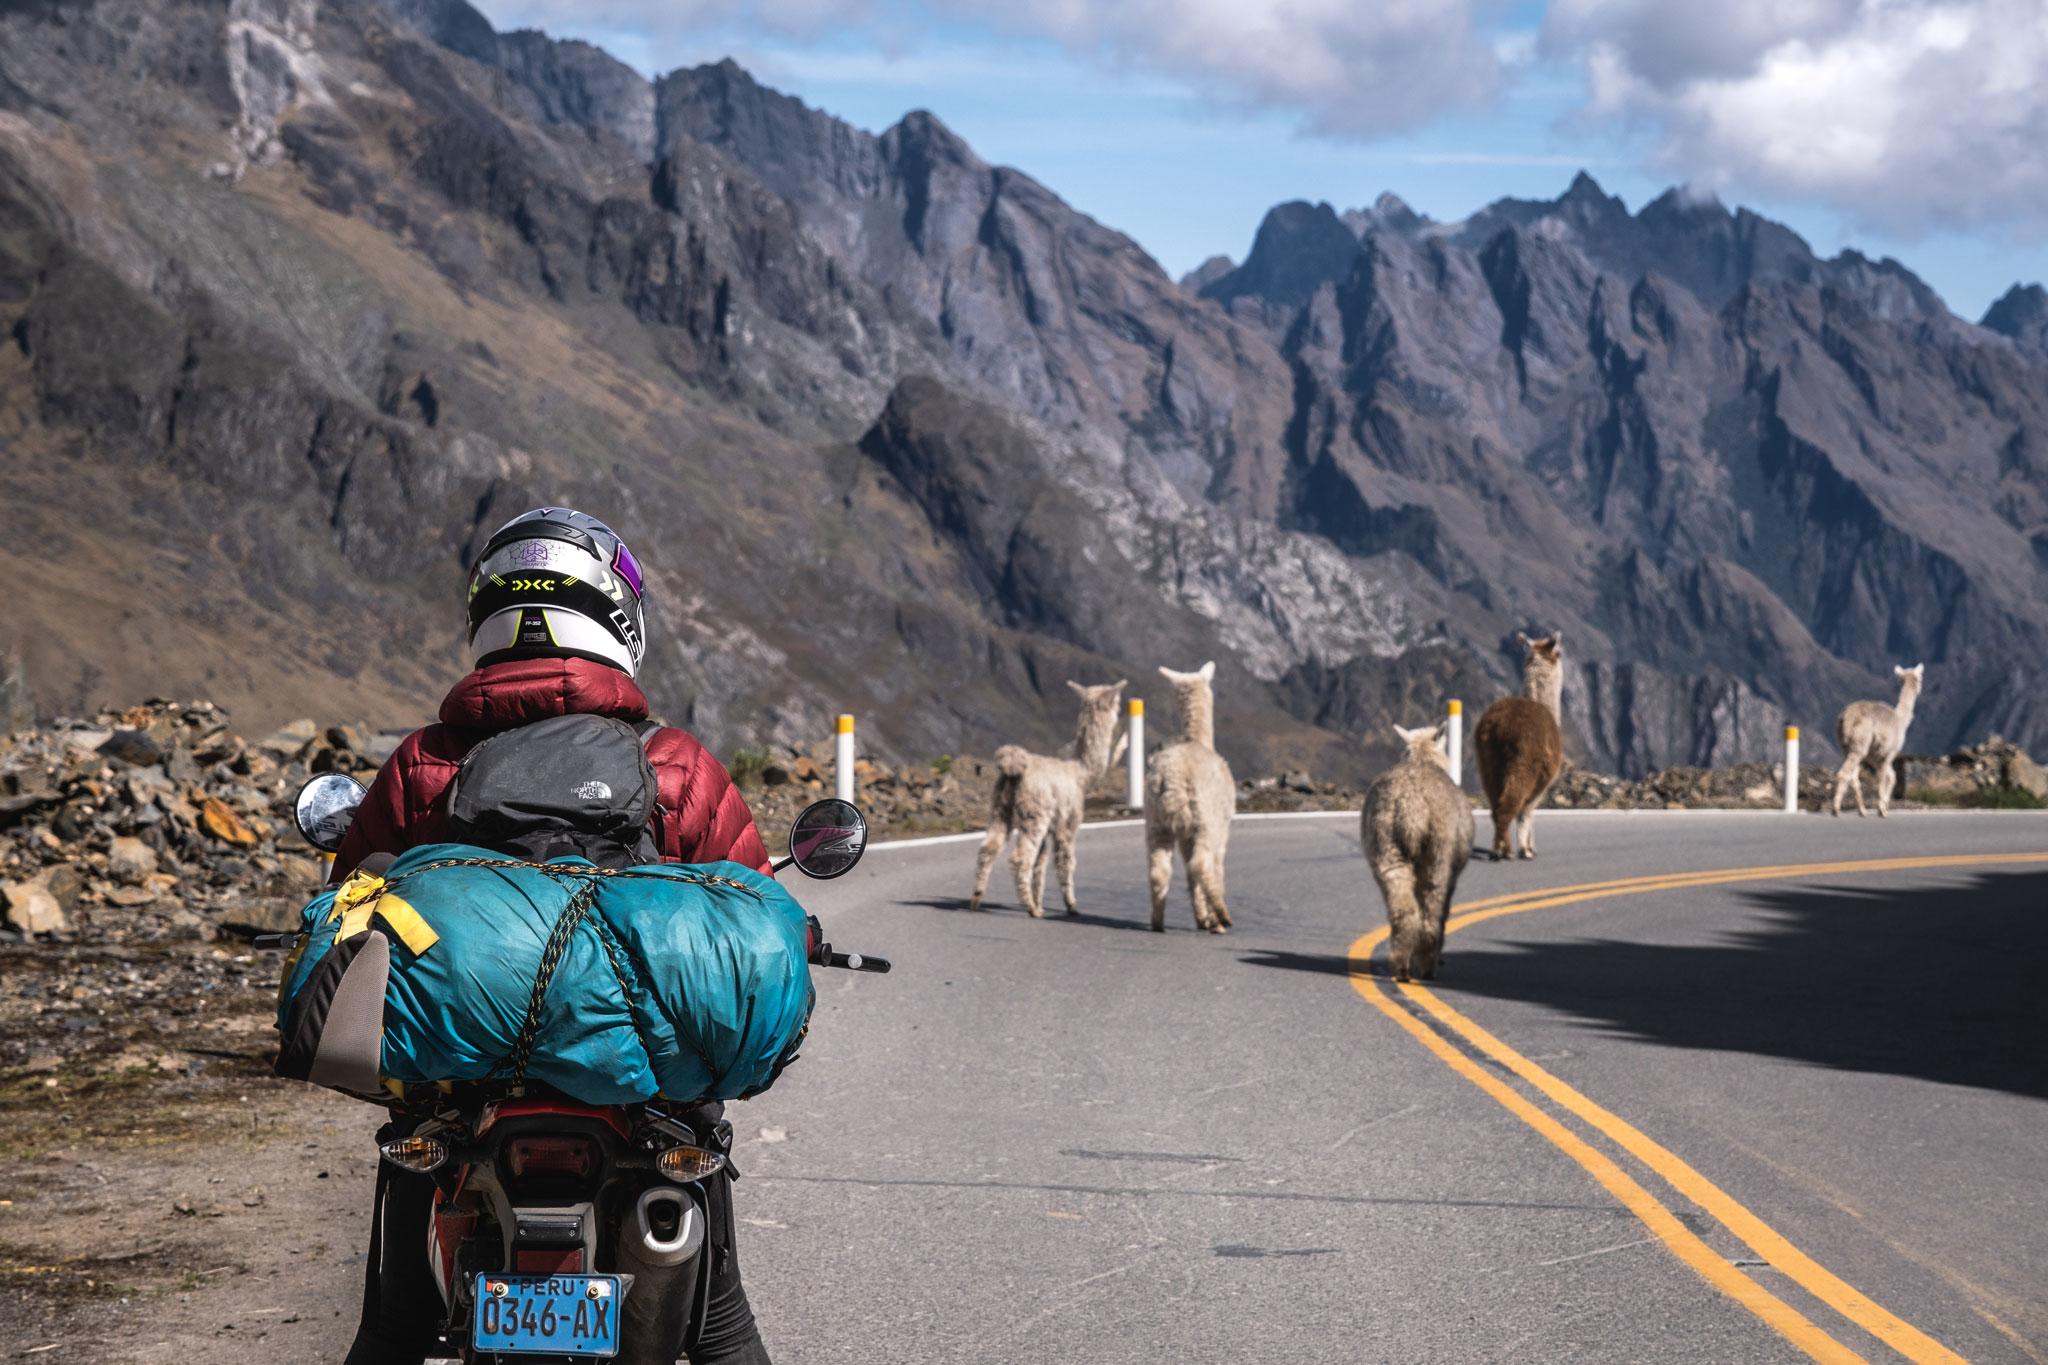 riding-with-alpacas